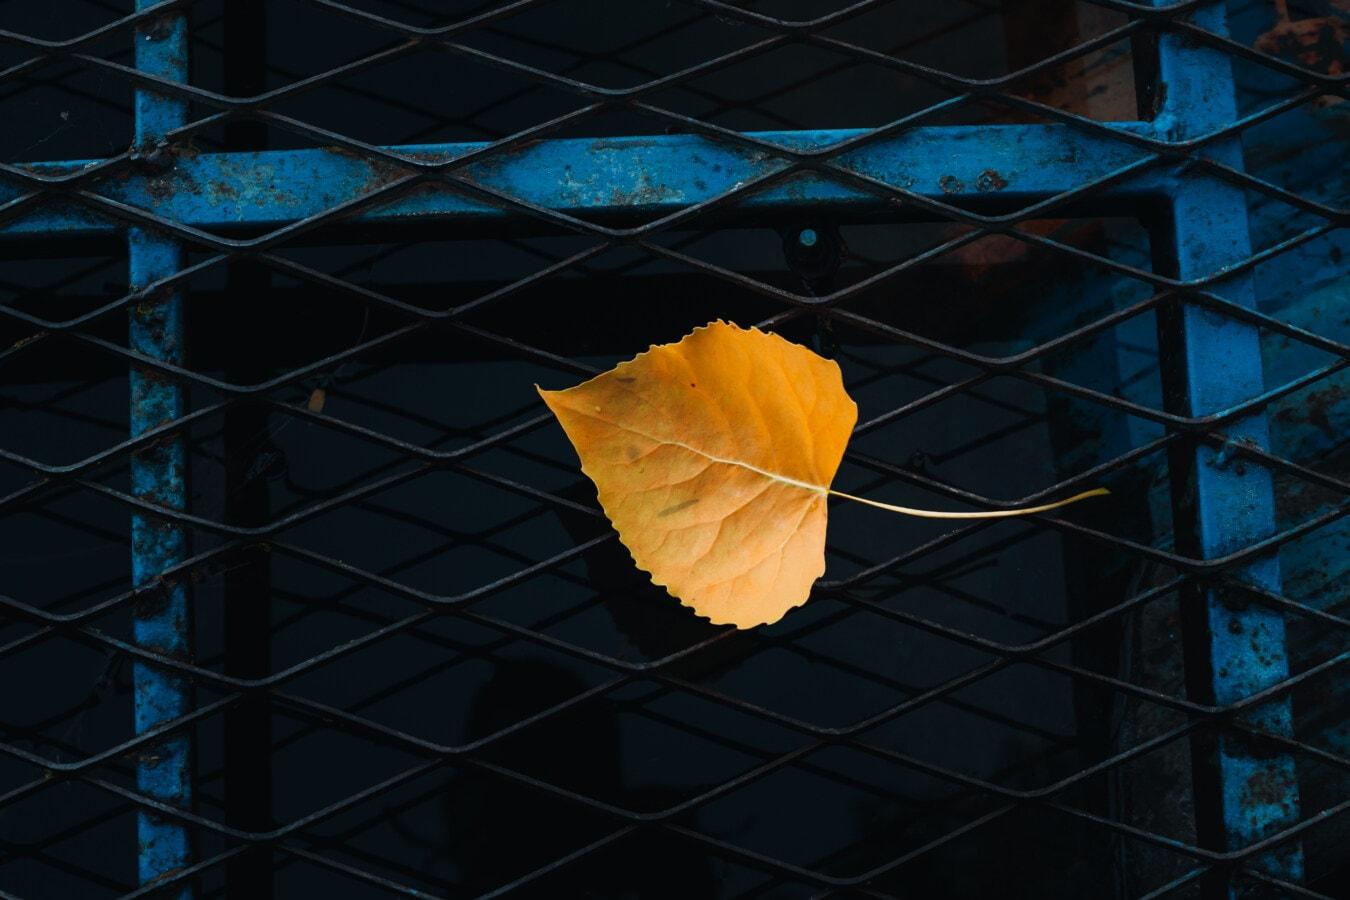 leaf, yellow, metal, grid, iron, steel, architecture, color, dark, urban